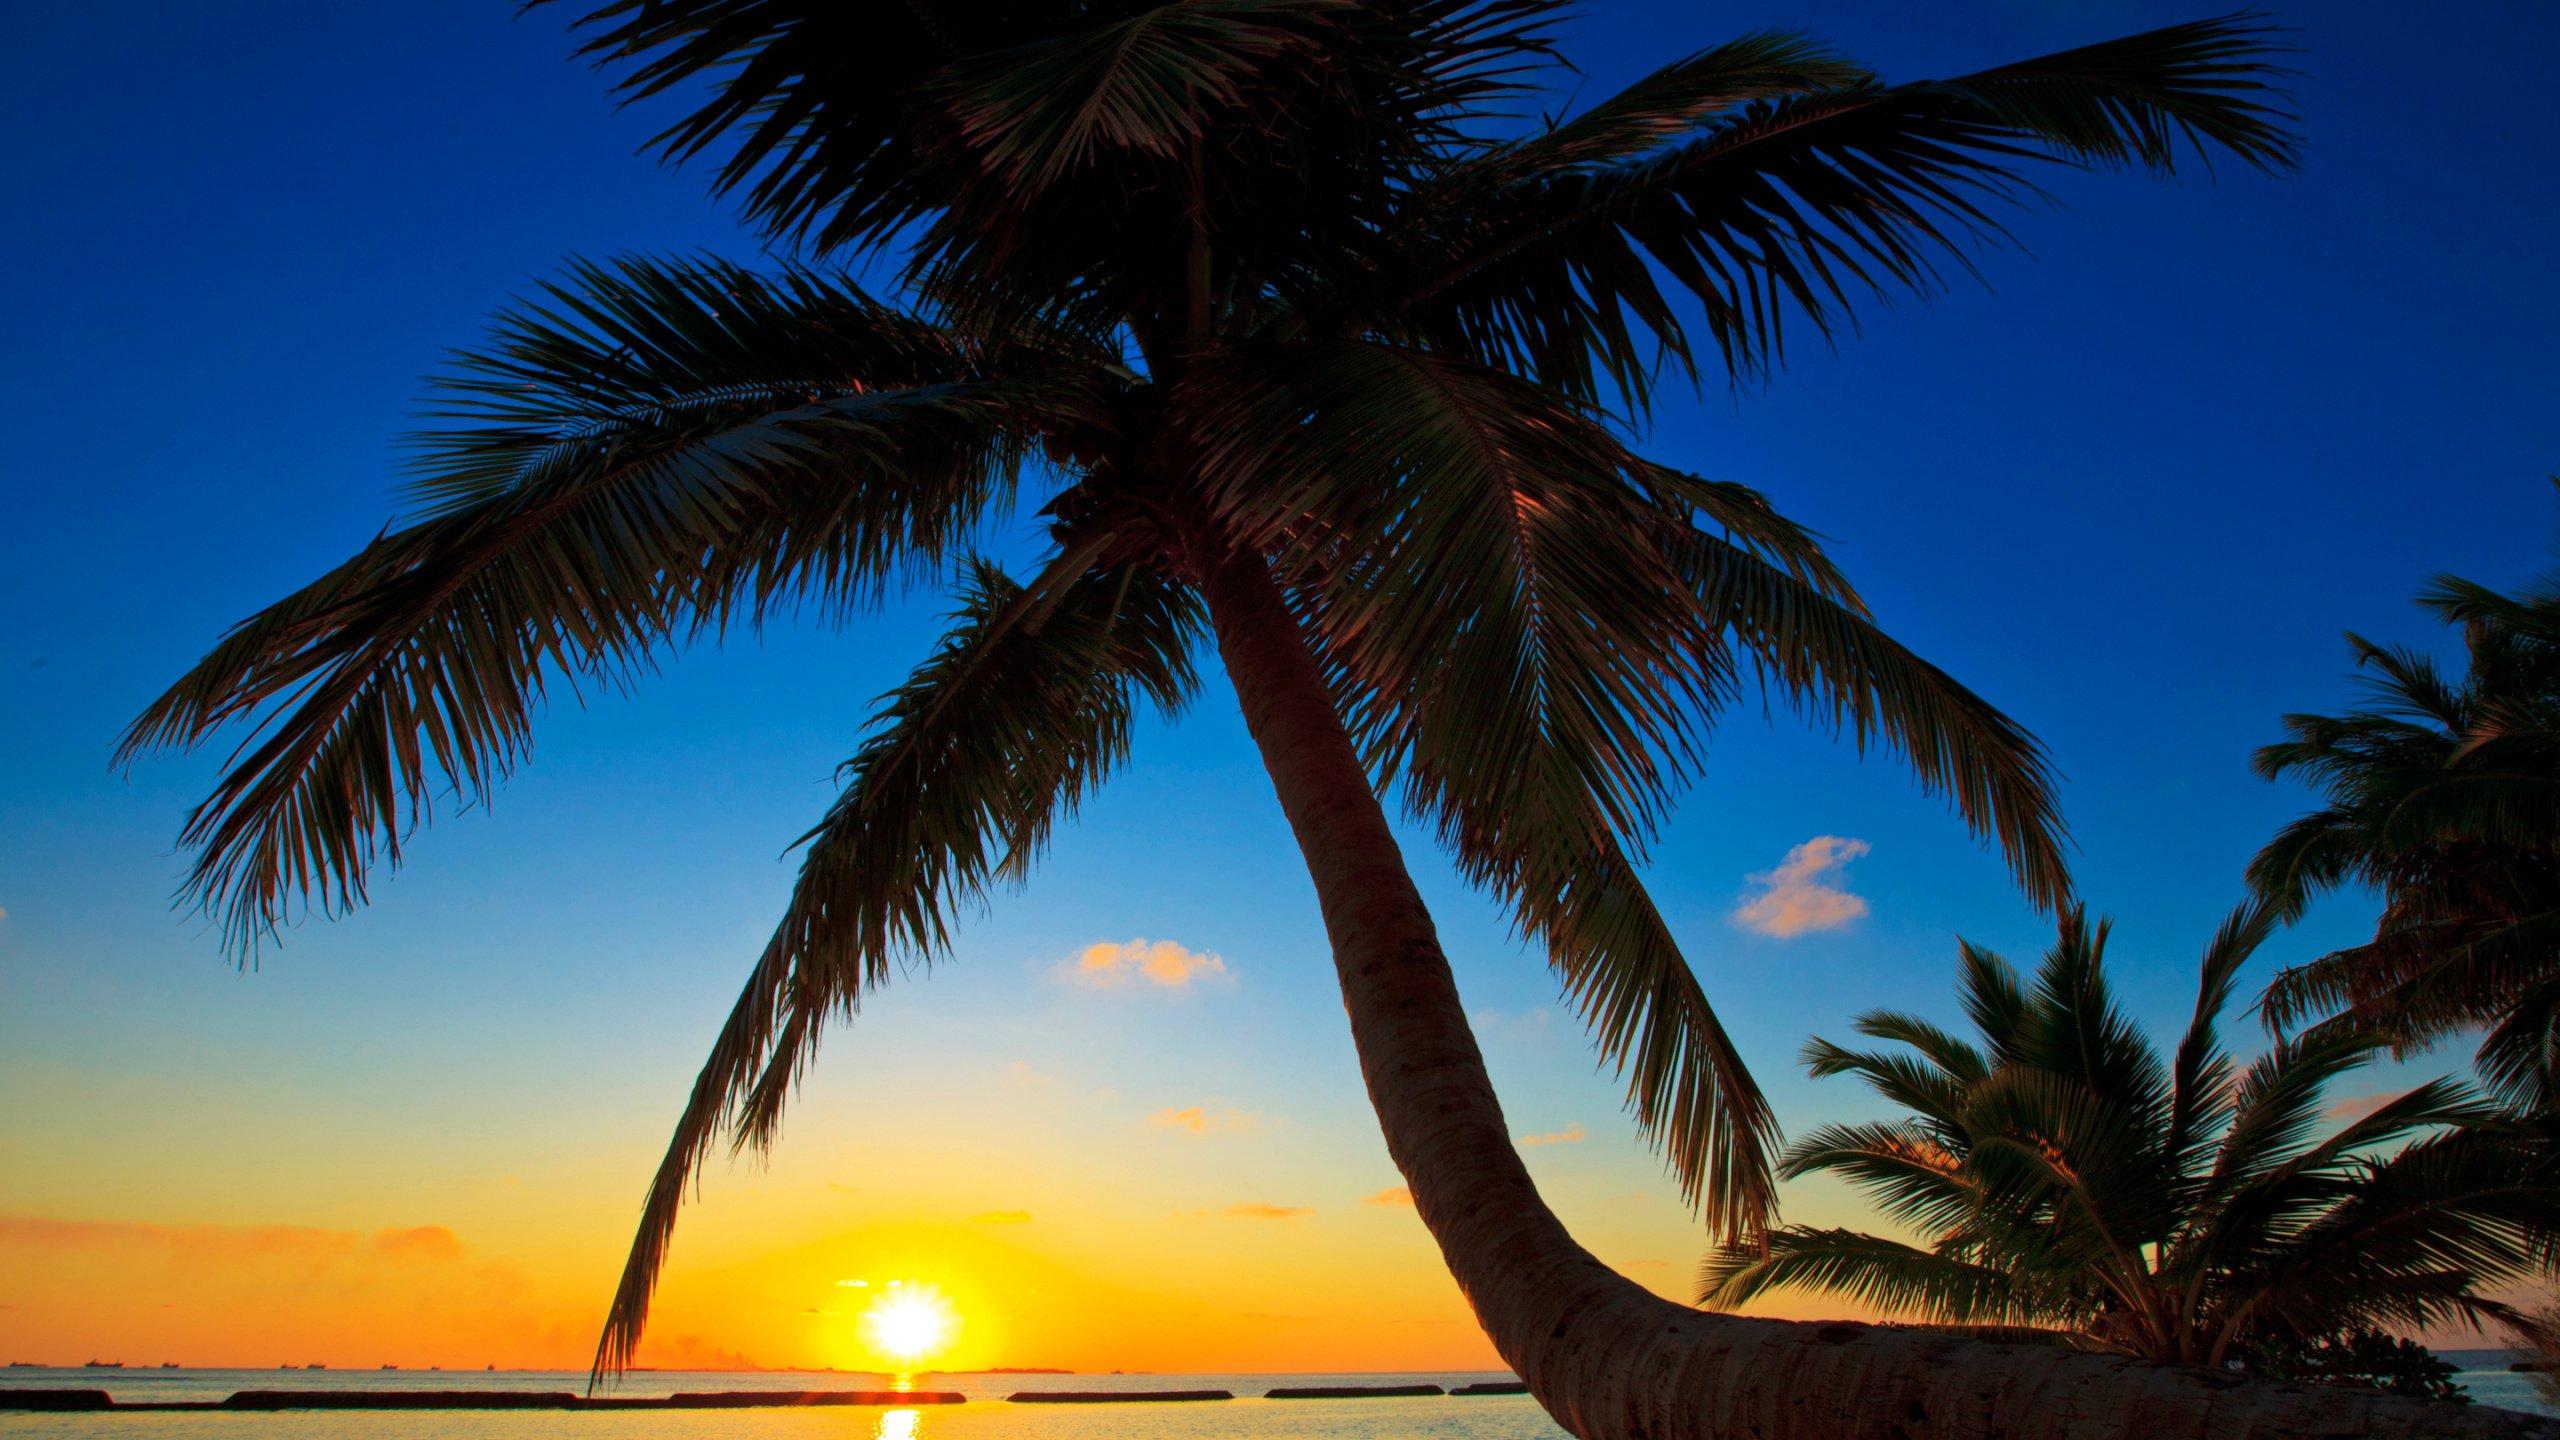 Palm Tree Screensaver Background Wallpaper